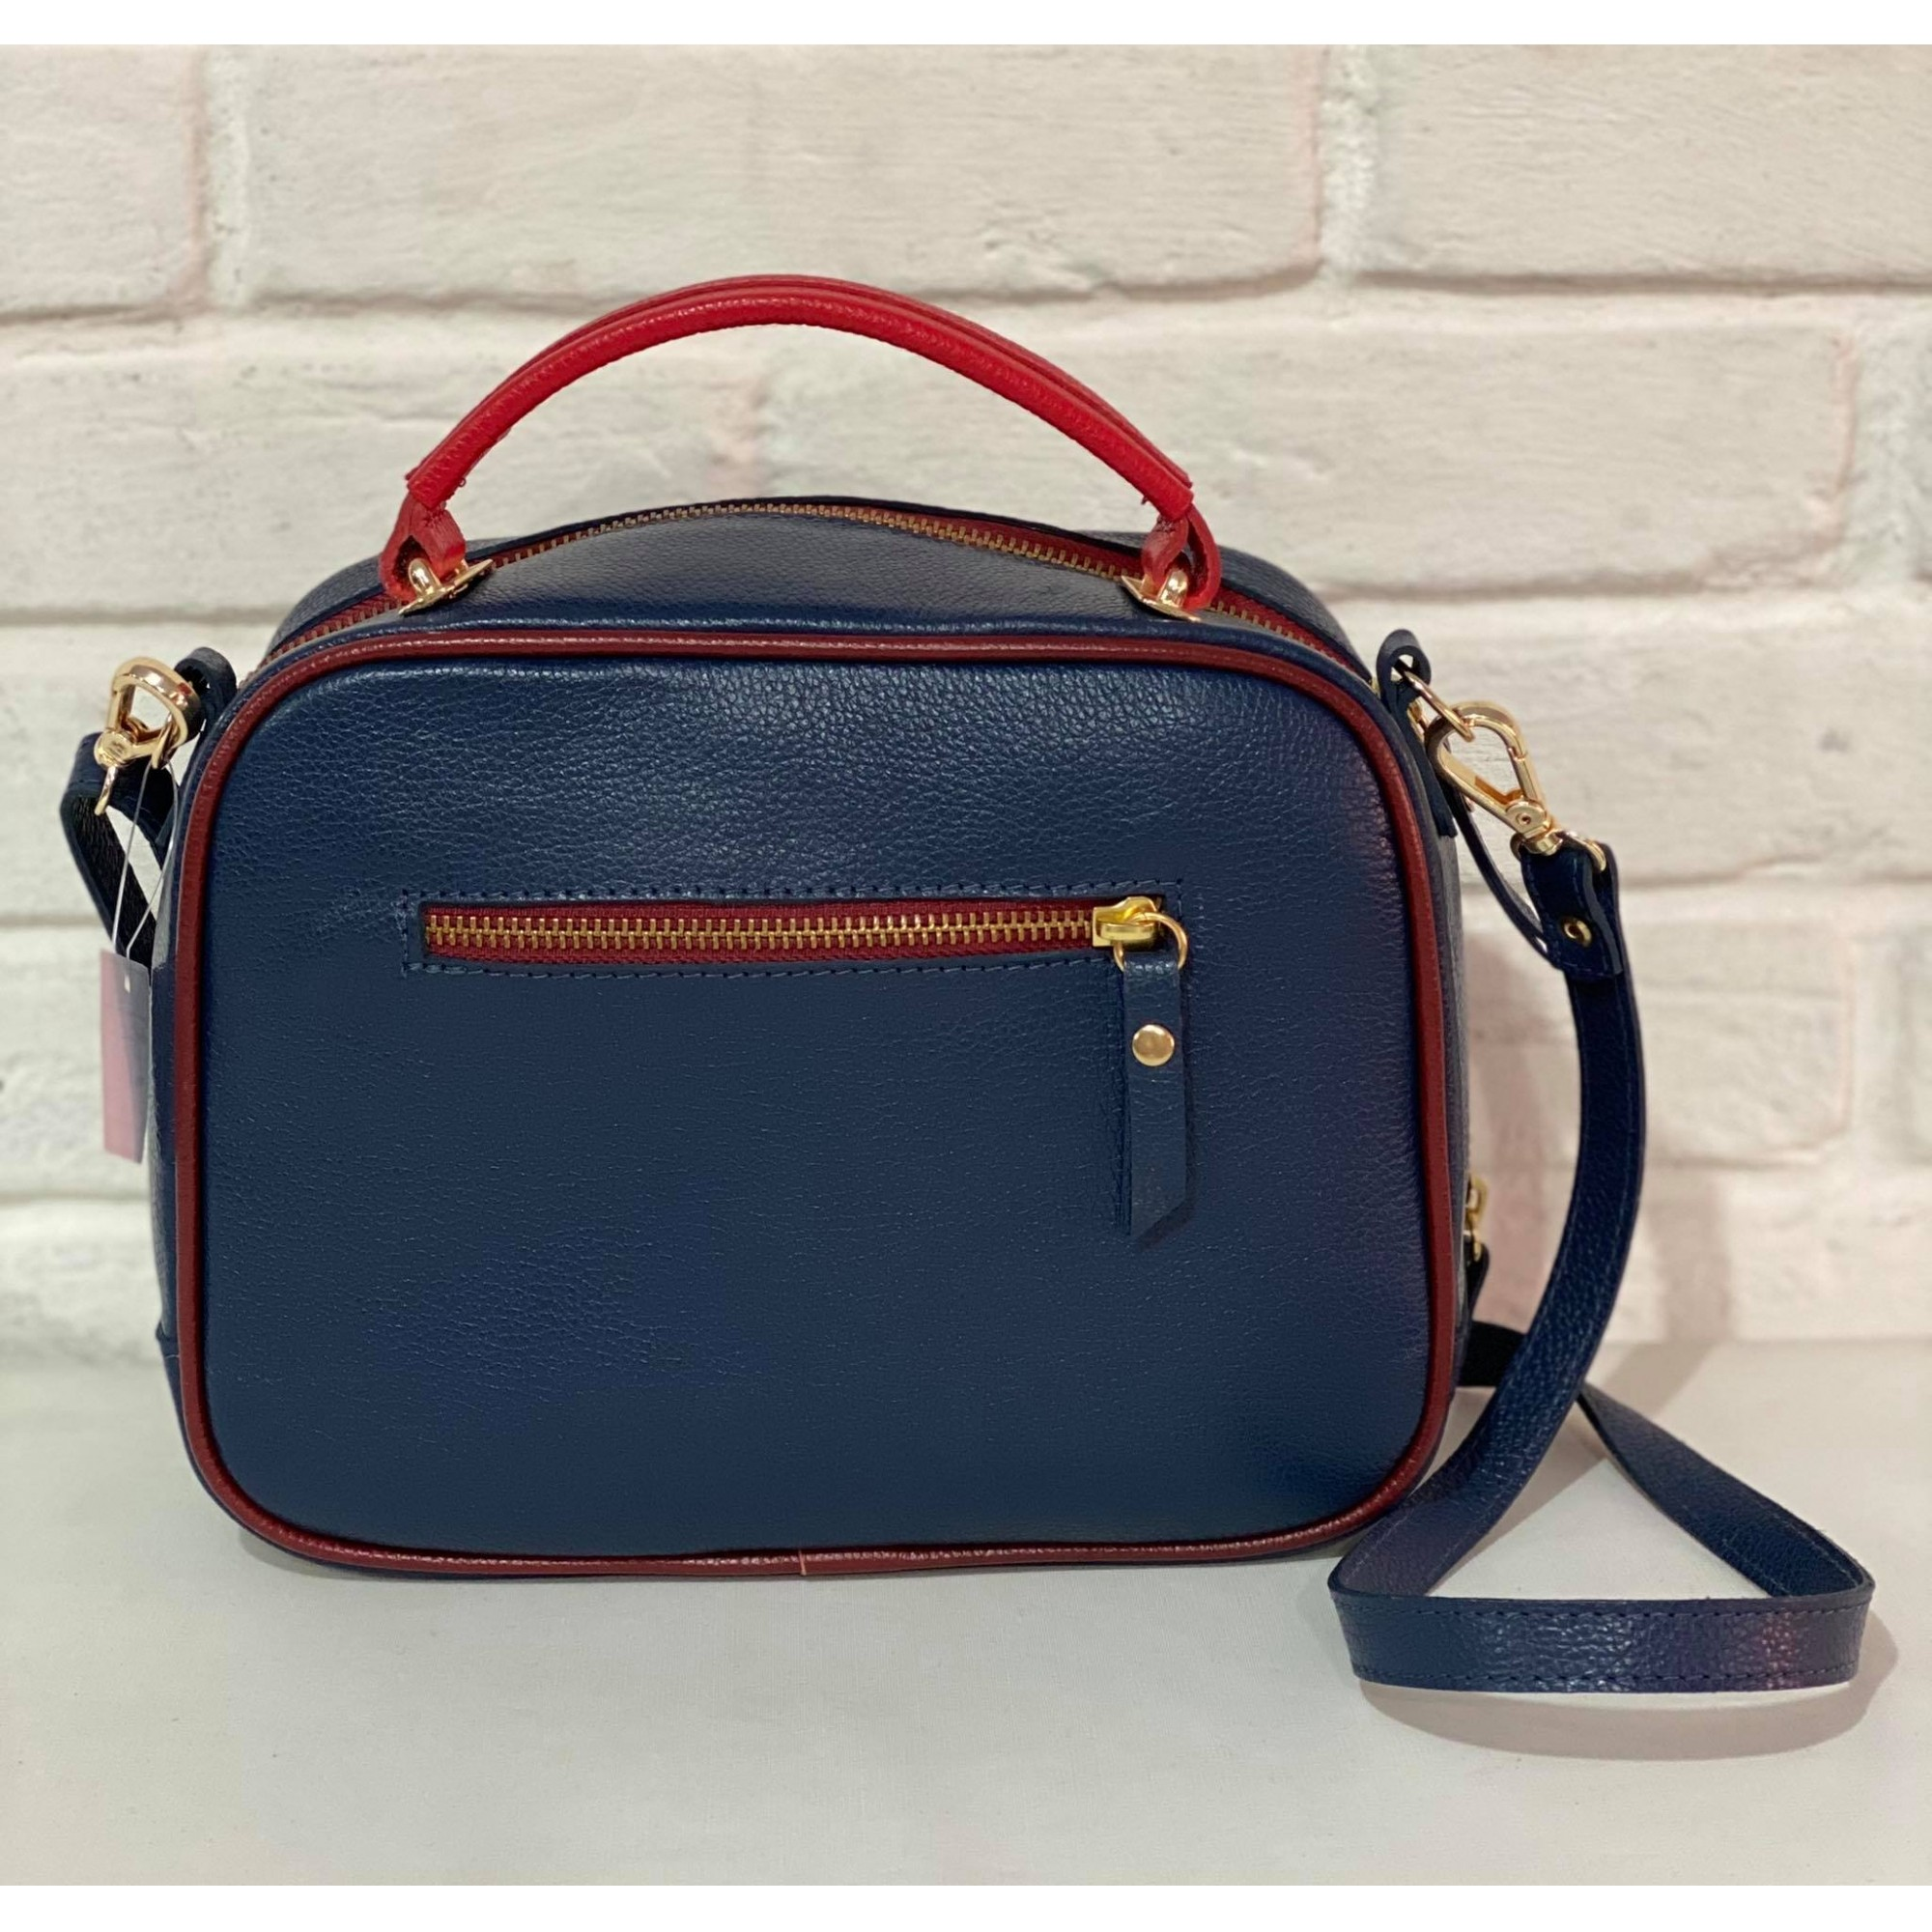 Bolsa Lastucci Transversal 1010840b Azul e Vermelho